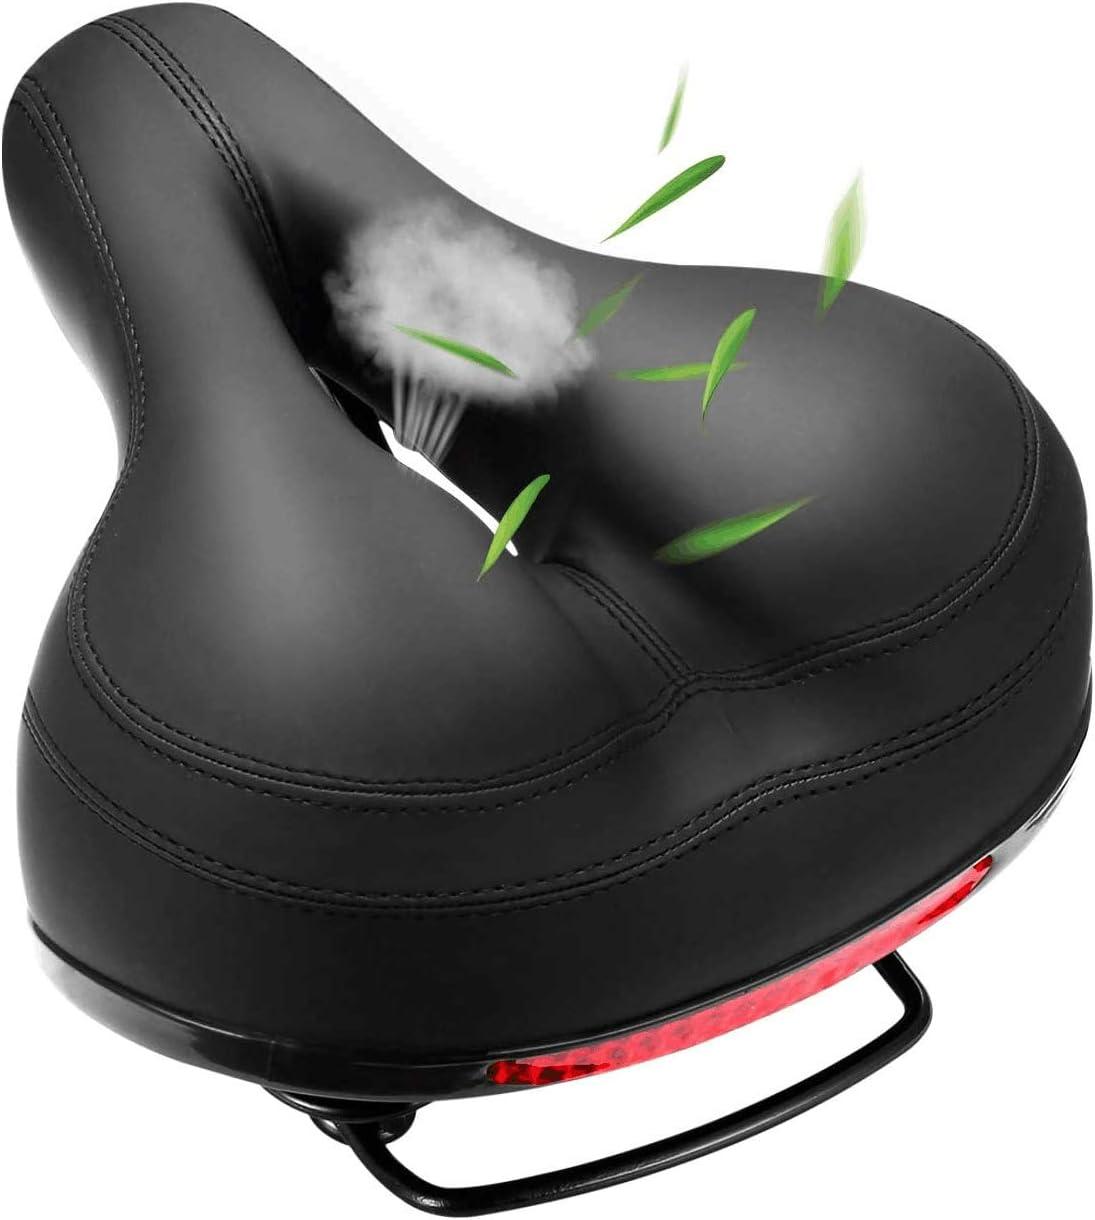 HNXCBH Bike seat Soft Wide Bicycle Saddle Comfortable Bike Seat Vintage Bicycle PU Saddle Pad Waterproof Cycling Parts Accessories